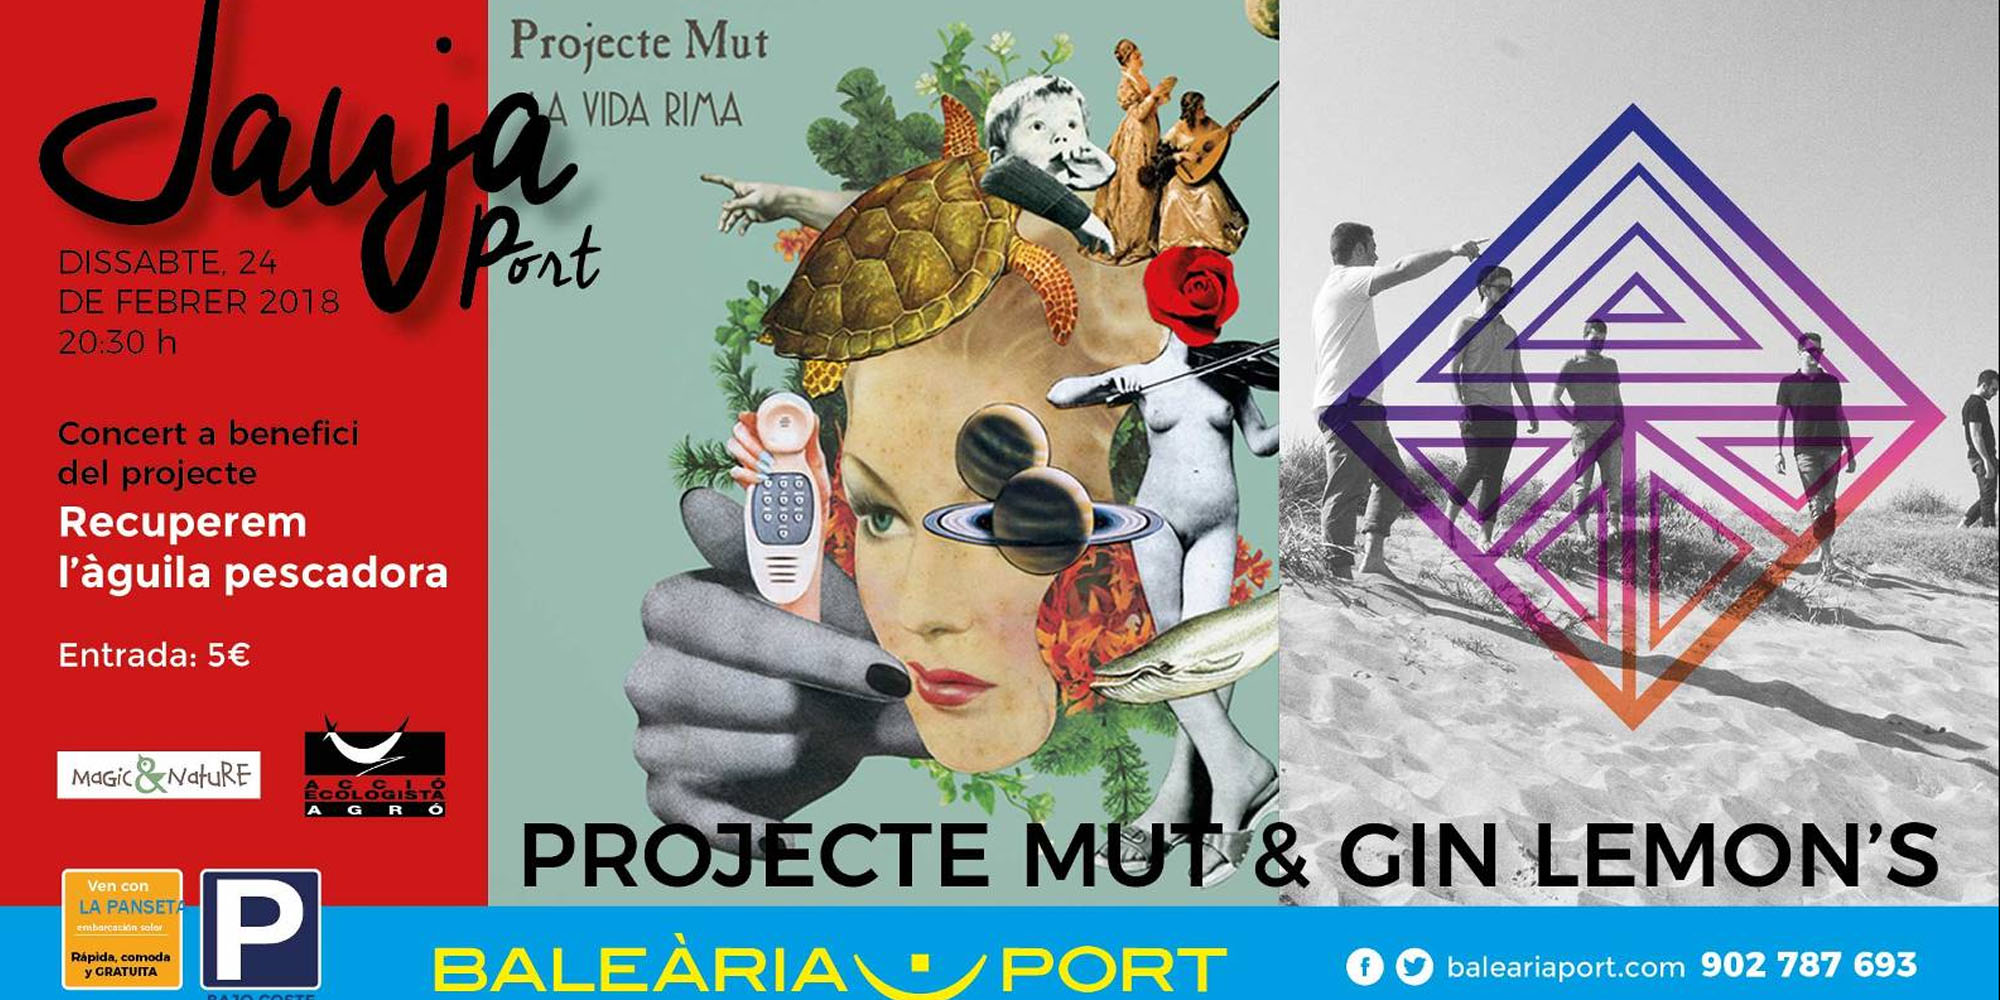 Concierto: Projecte Mut & Gin Lemon's